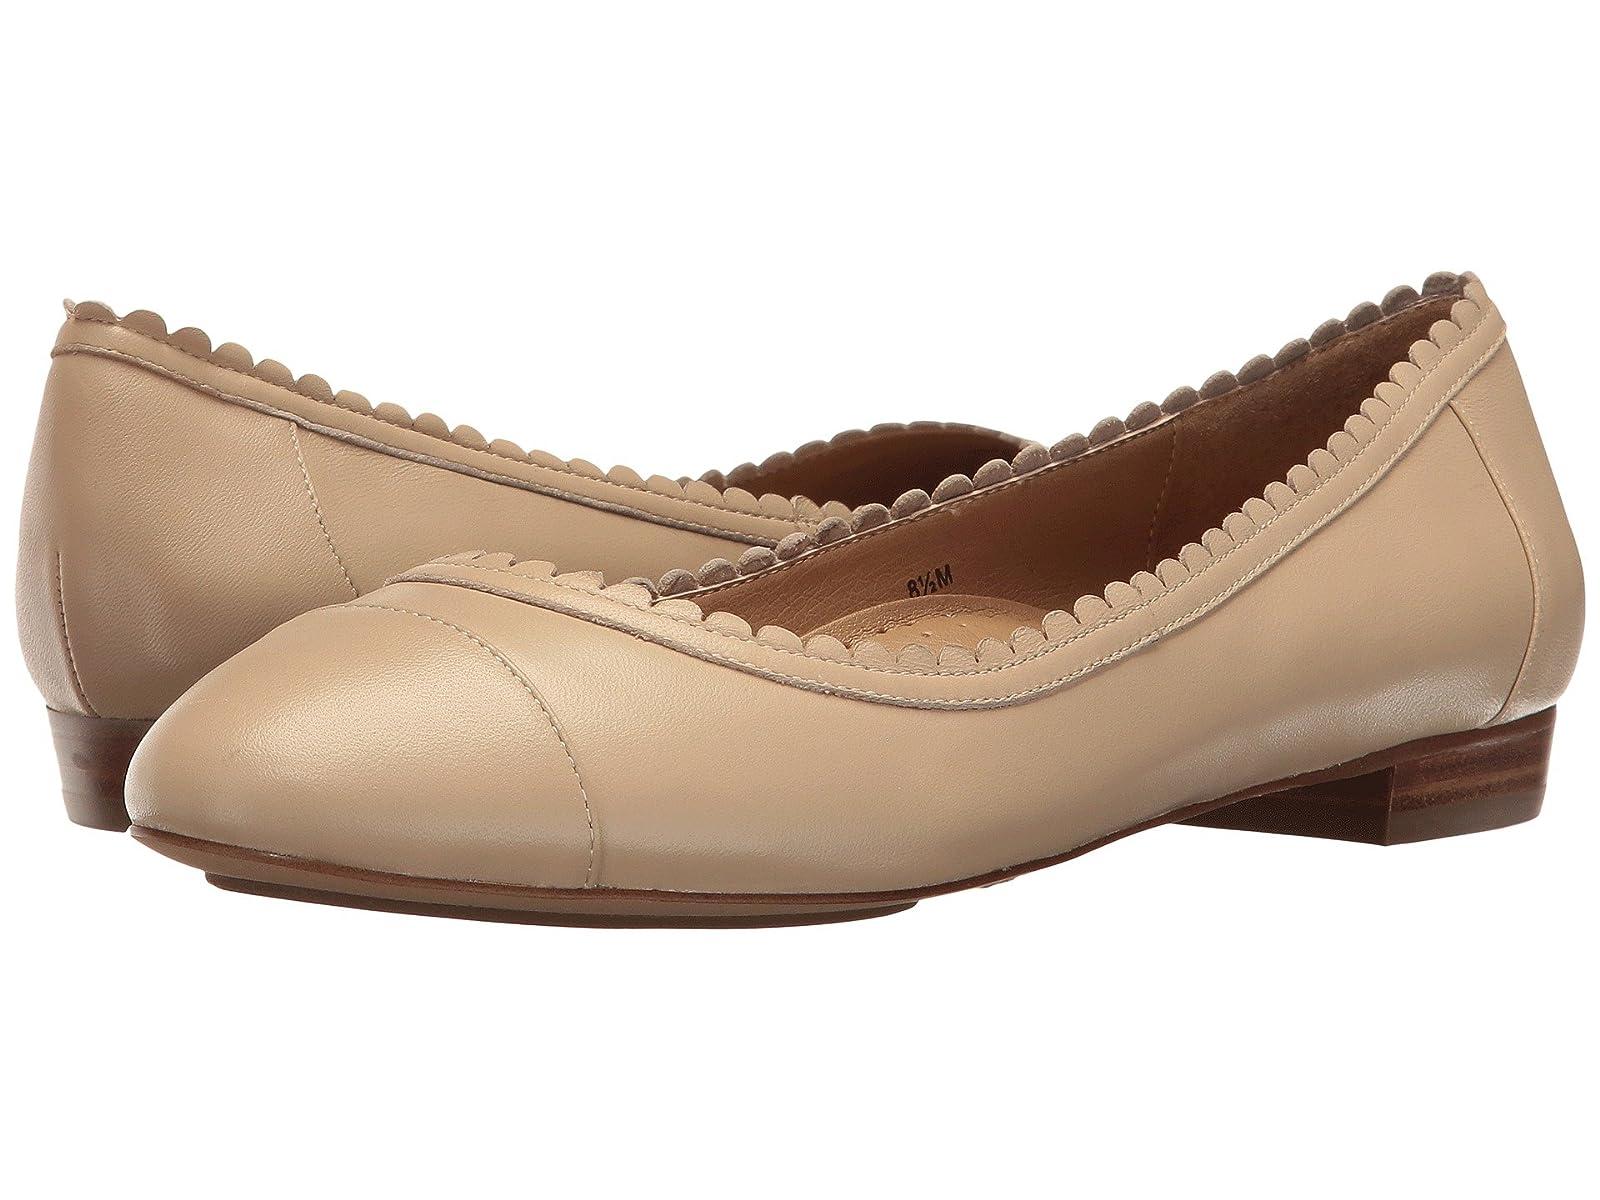 Vaneli CabotCheap and distinctive eye-catching shoes